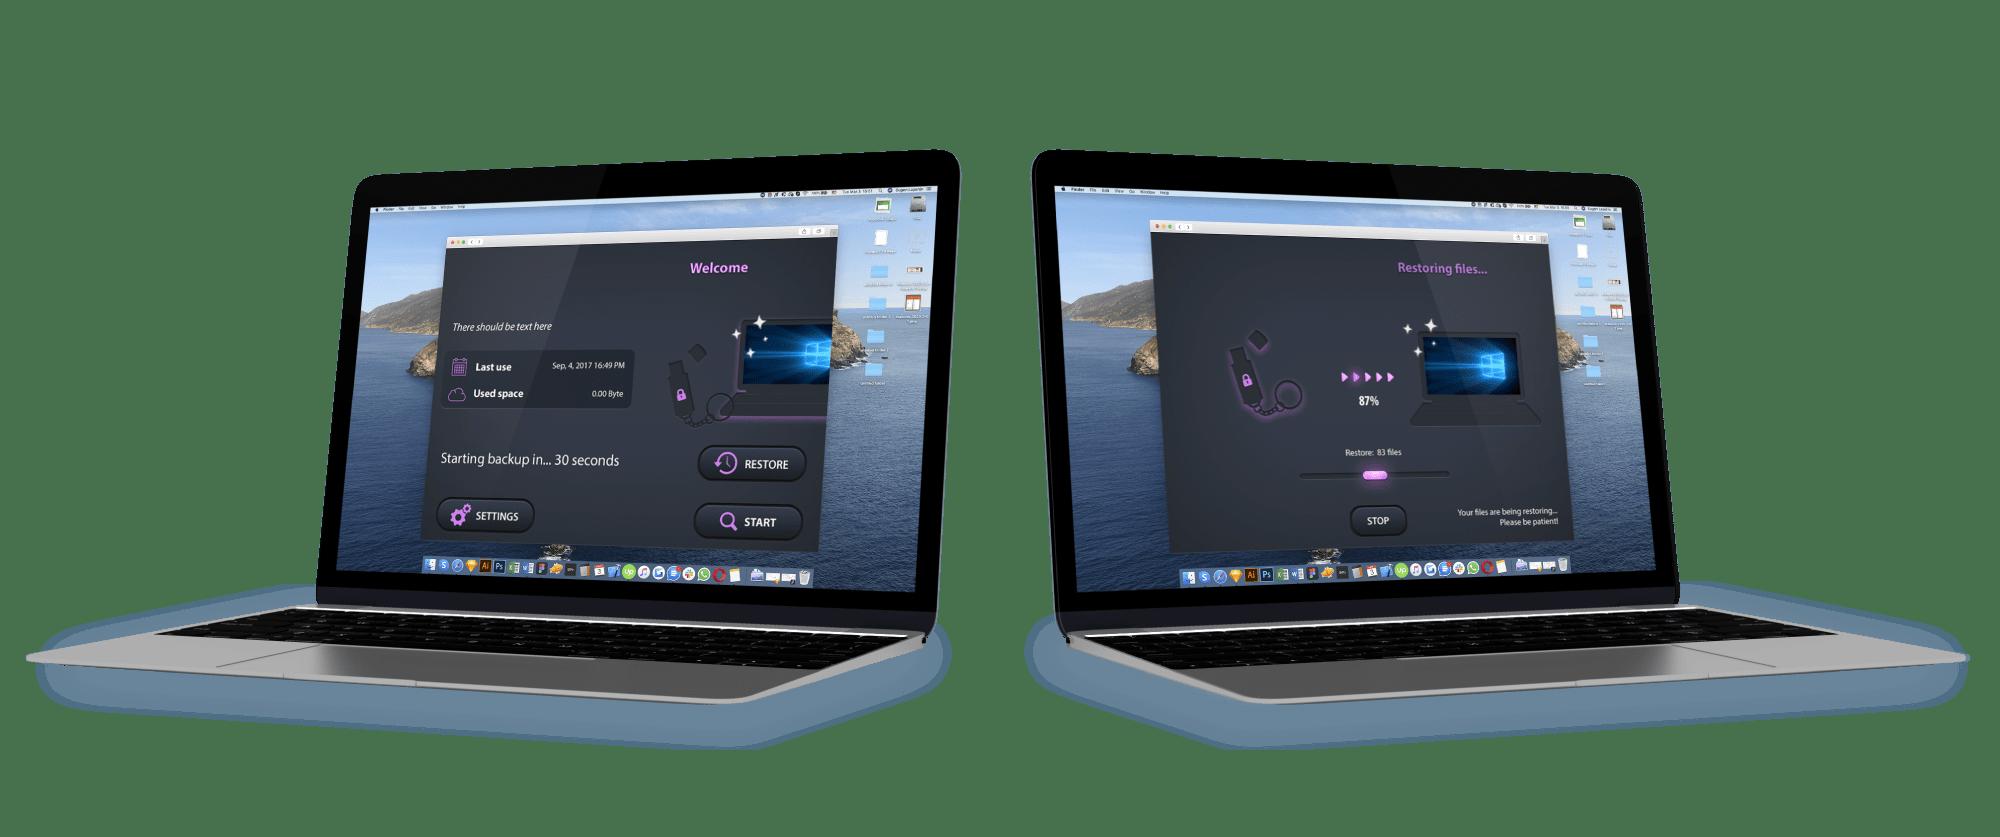 LifeLocket solution